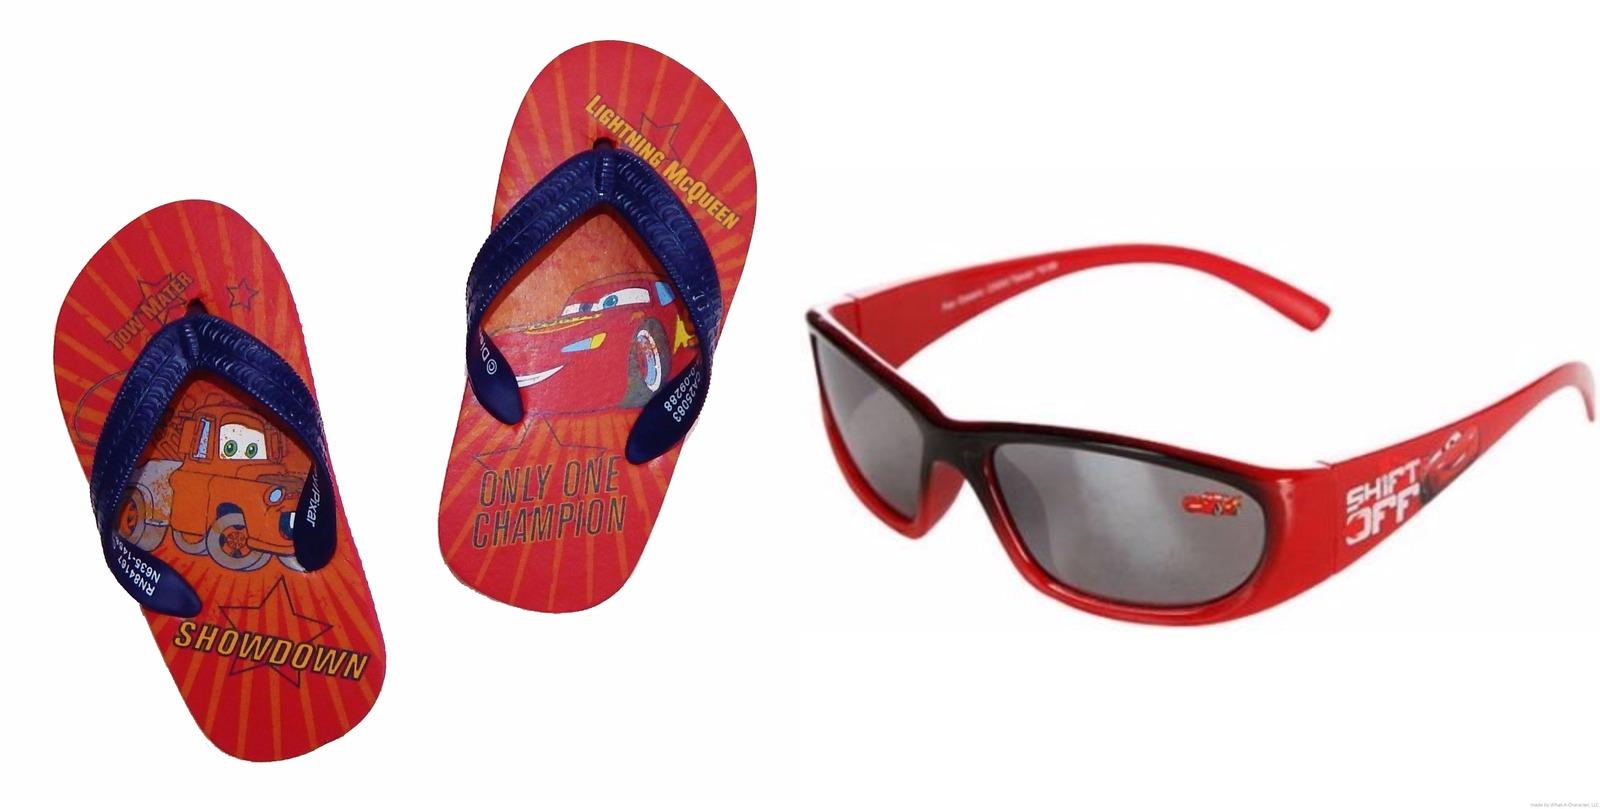 DISNEY CARS Flip Flops w/Optional Sunglasses Beach Sandals Toddler's Size 9/10